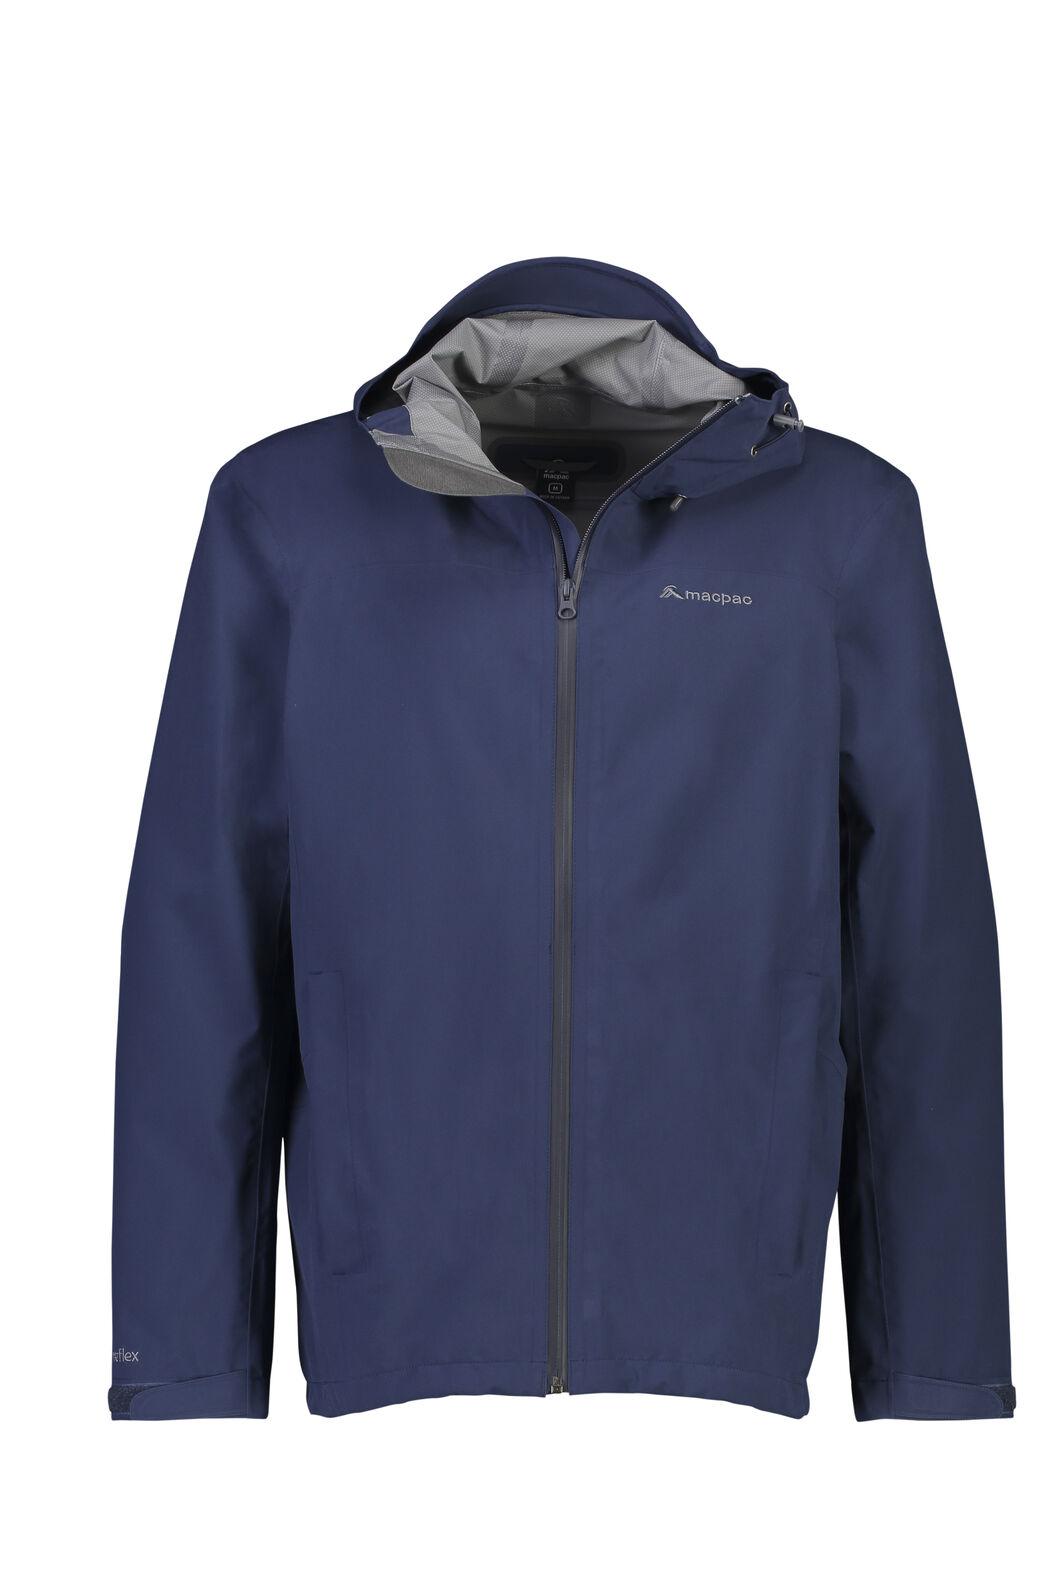 Macpac Dispatch Rain Jacket — Men's, Black Iris, hi-res